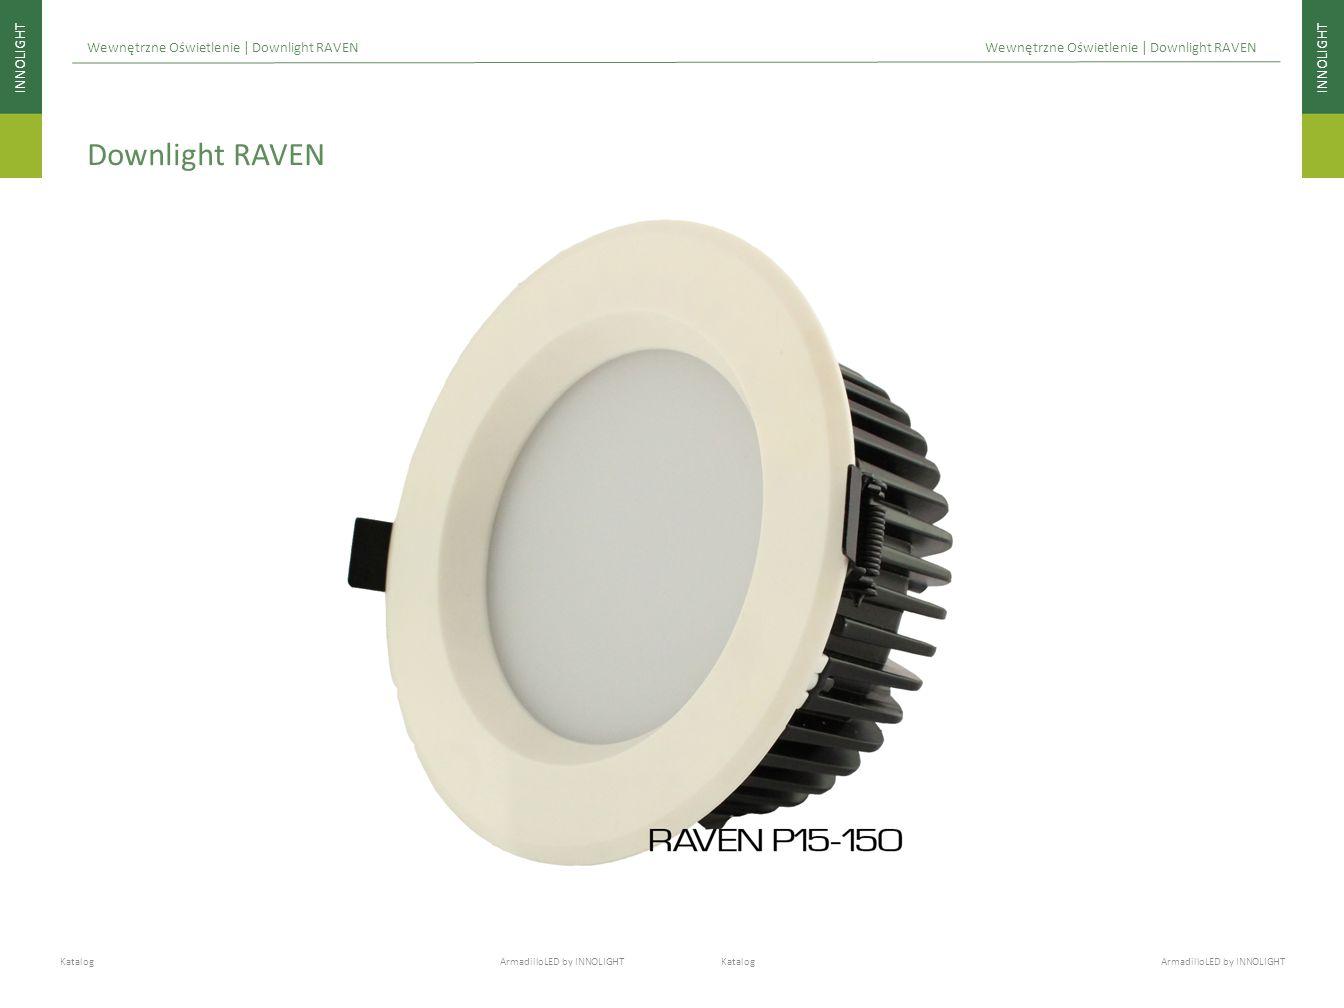 INNOLIGHT Katalog ArmadilloLED by INNOLIGHT Wewnętrzne Oświetlenie | Downlight RAVEN Downlight RAVEN